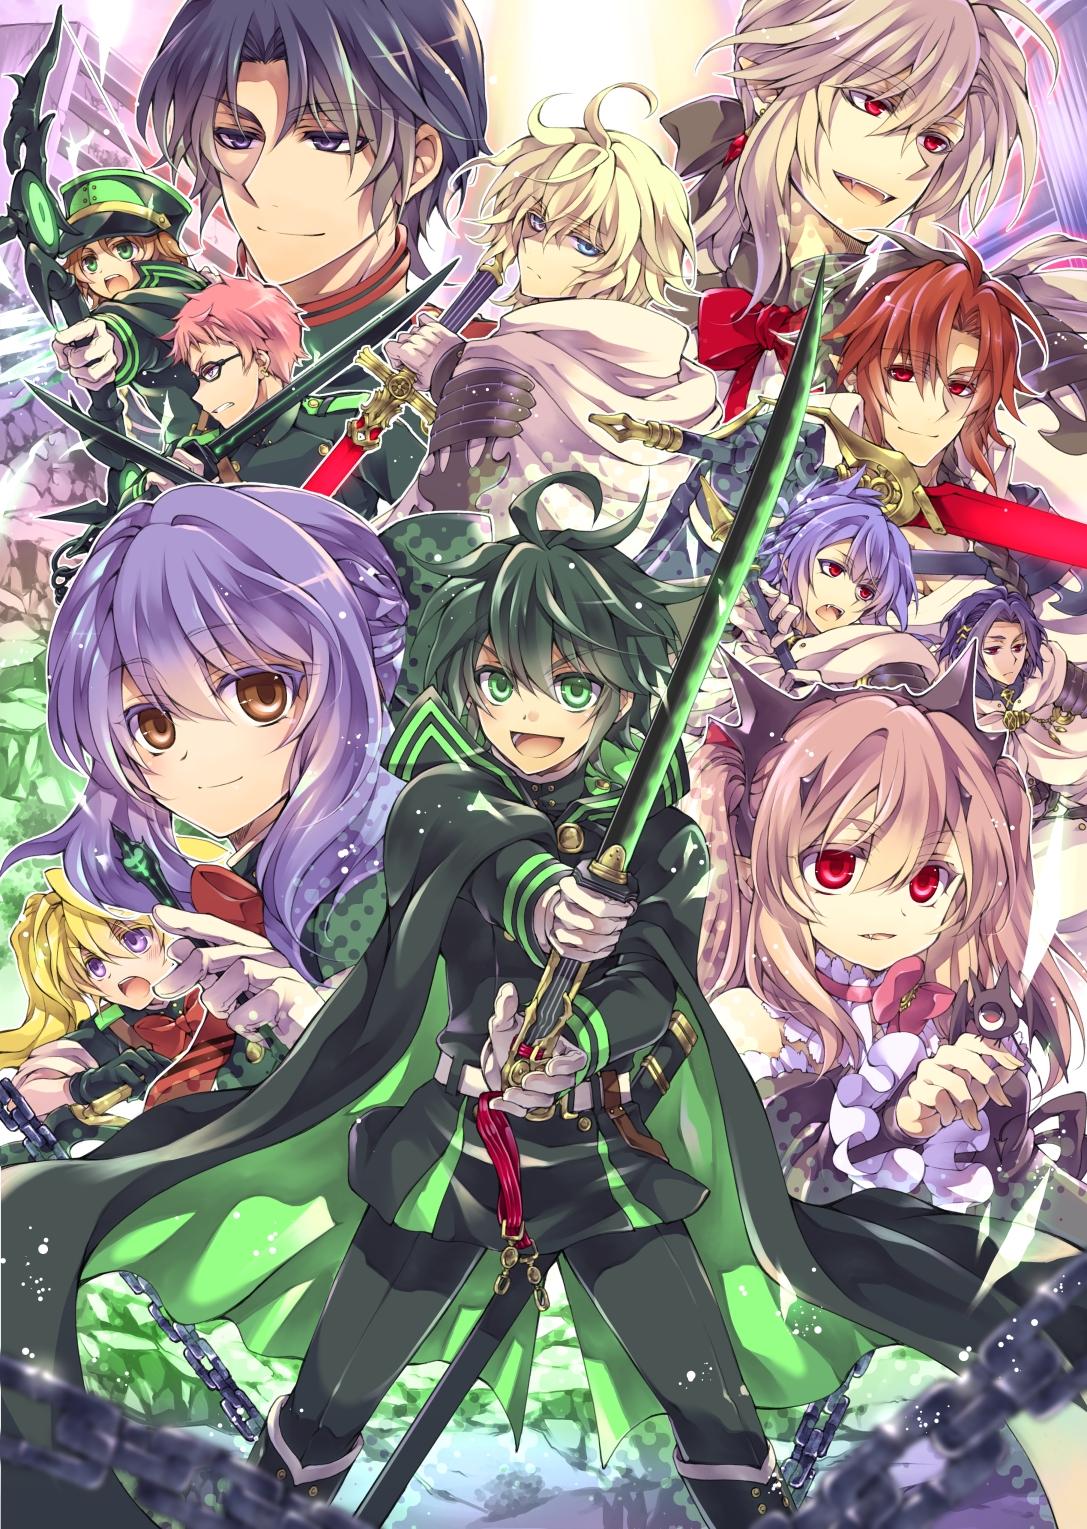 Crowley Eusford Owari No Seraph Zerochan Anime Image Board